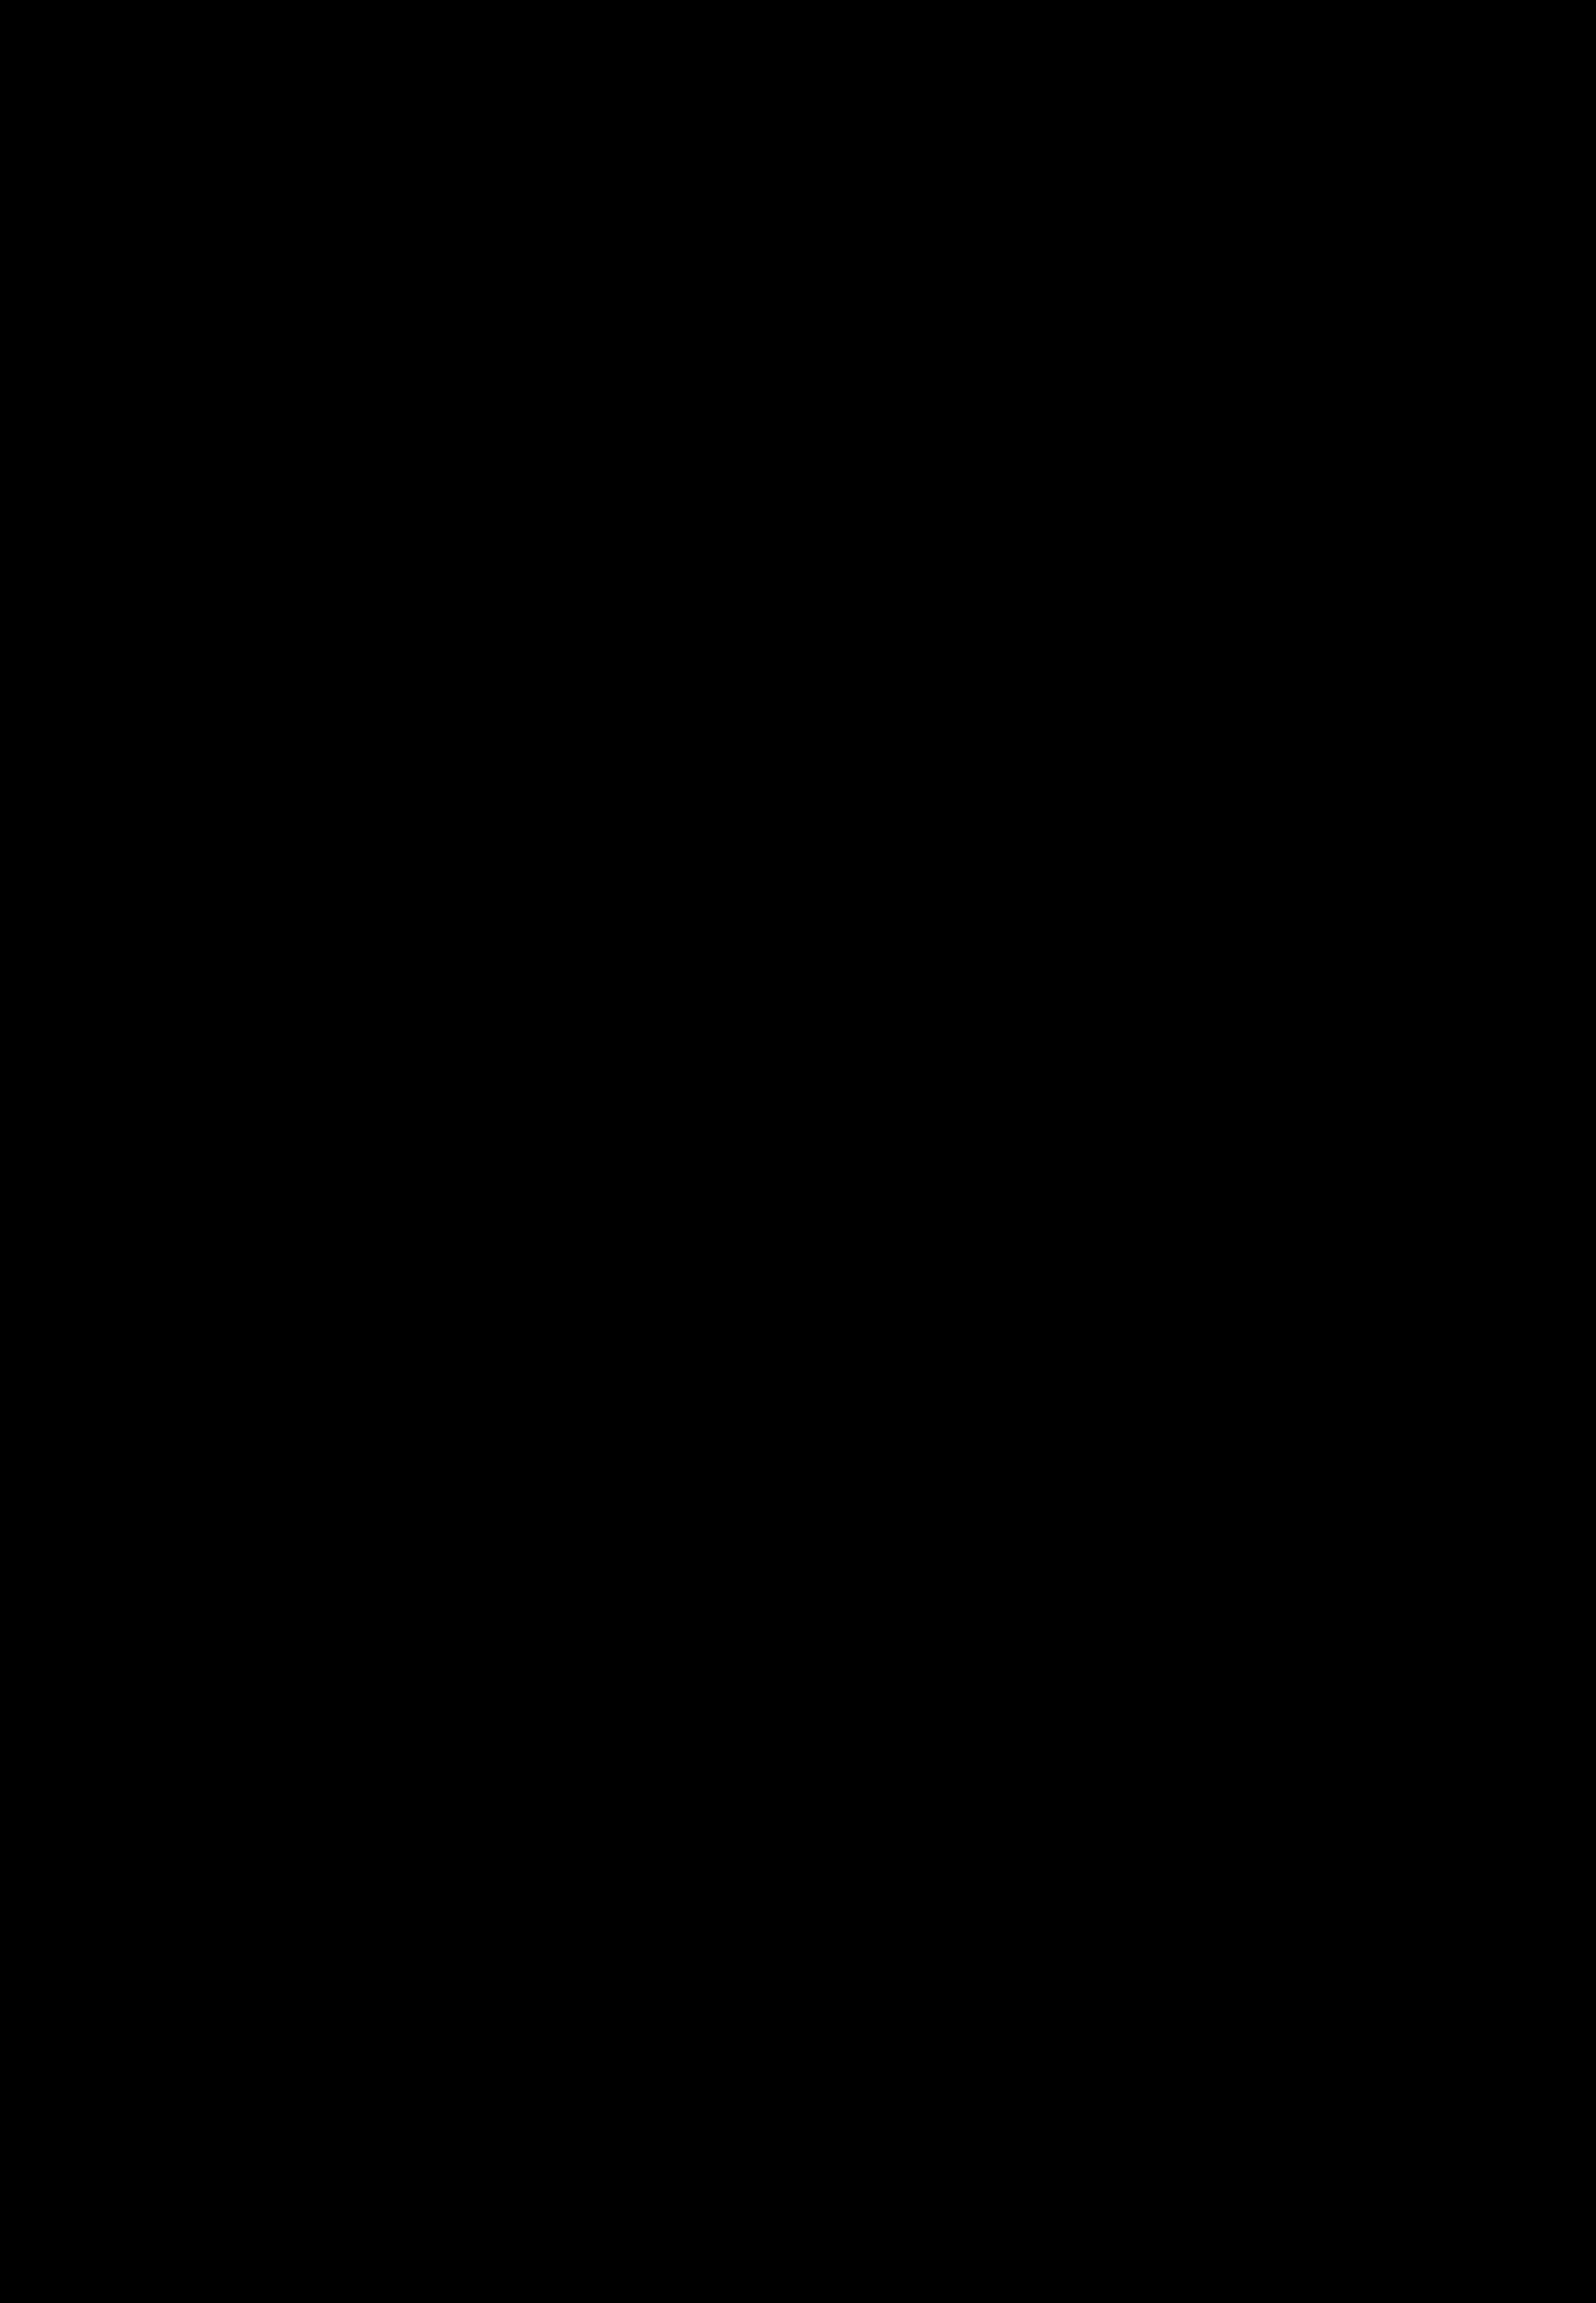 Pleurotus Djamor